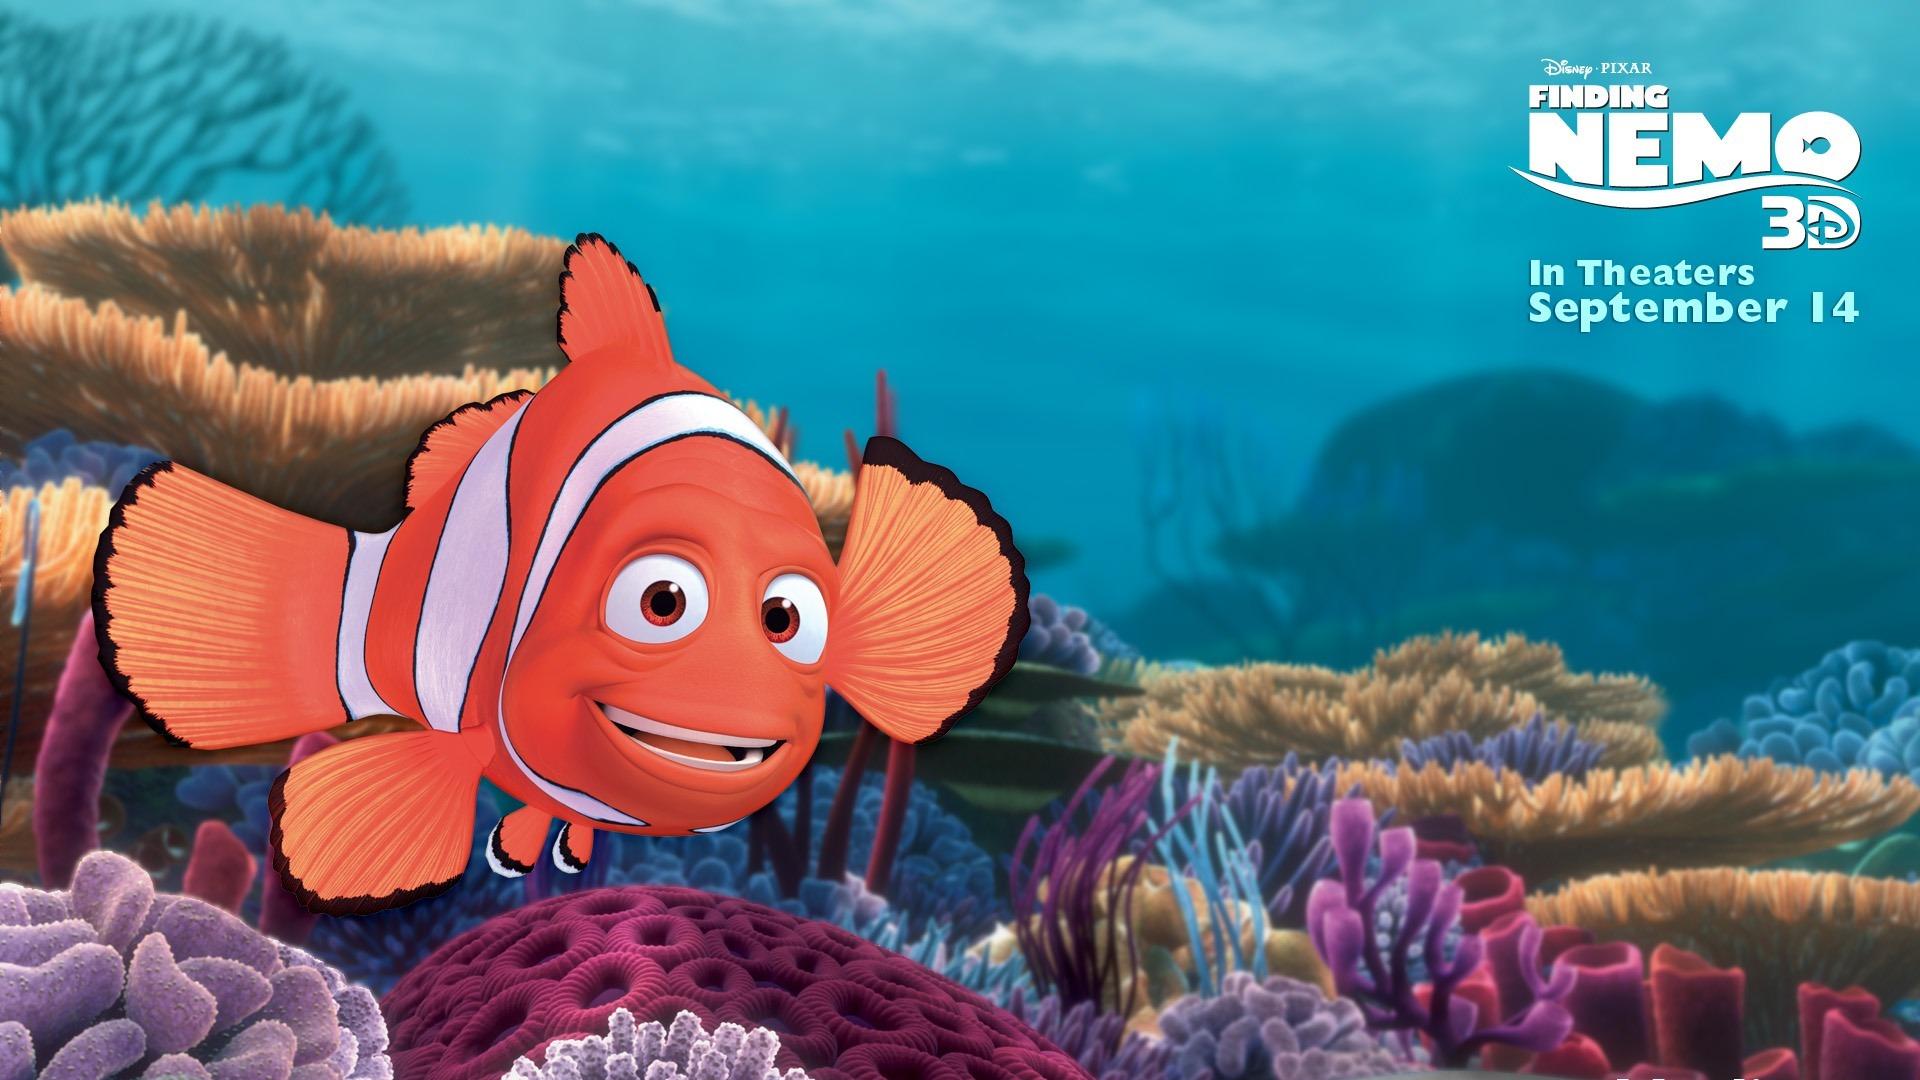 Finding Nemo D Animasi Hd Wallpaper: Marlin-Finding Nemo 3D 海底总动员 3D 2012电影HD桌面壁纸预览